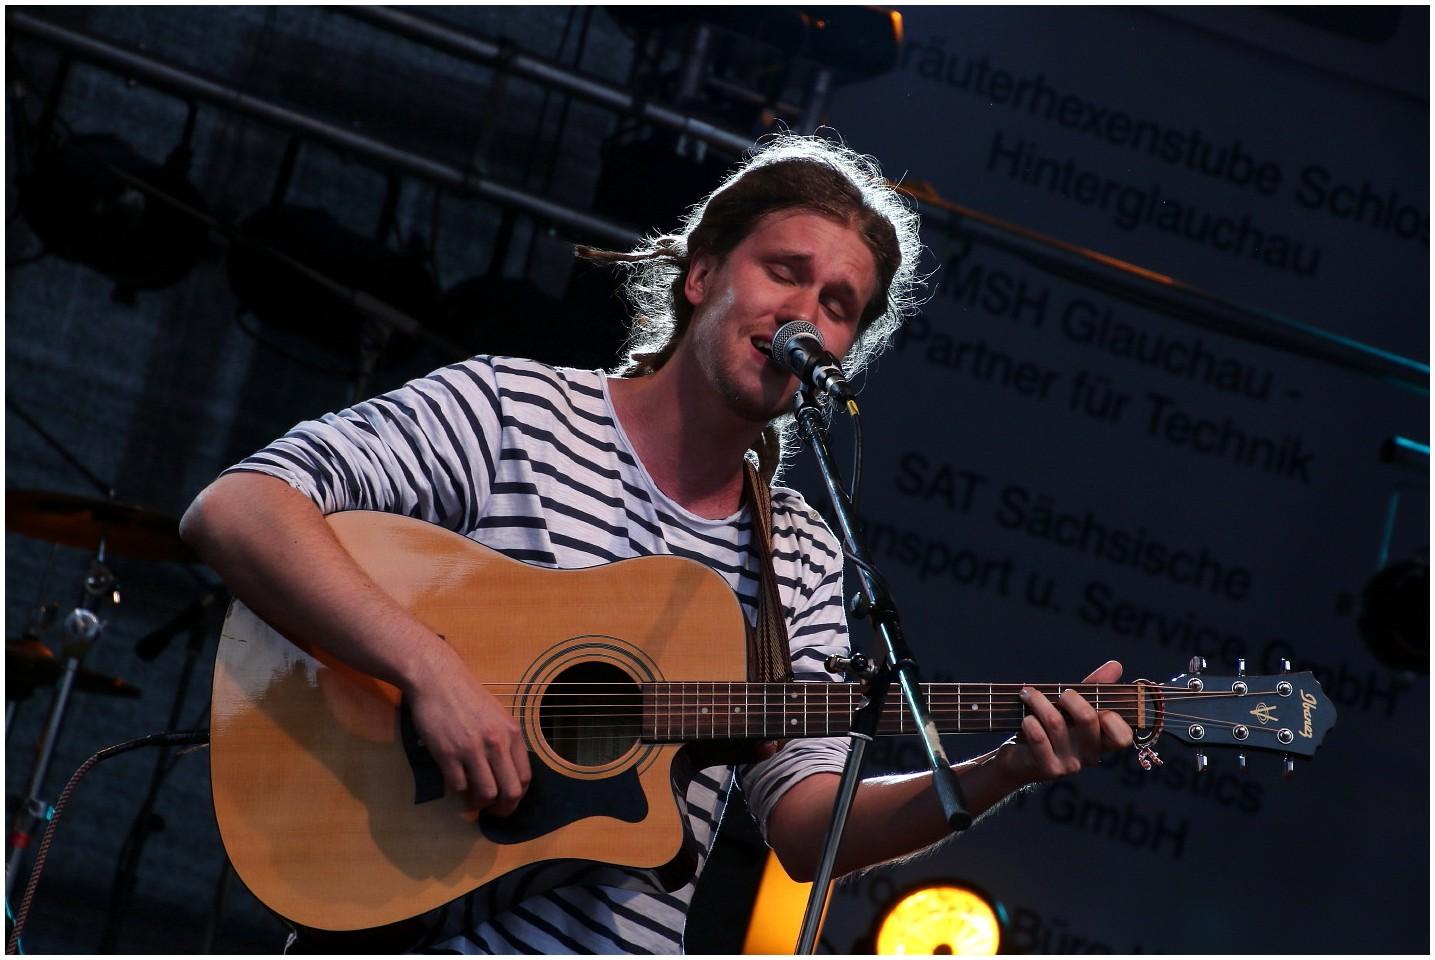 Sebastian Hackel & Band @ Glauchau (2)